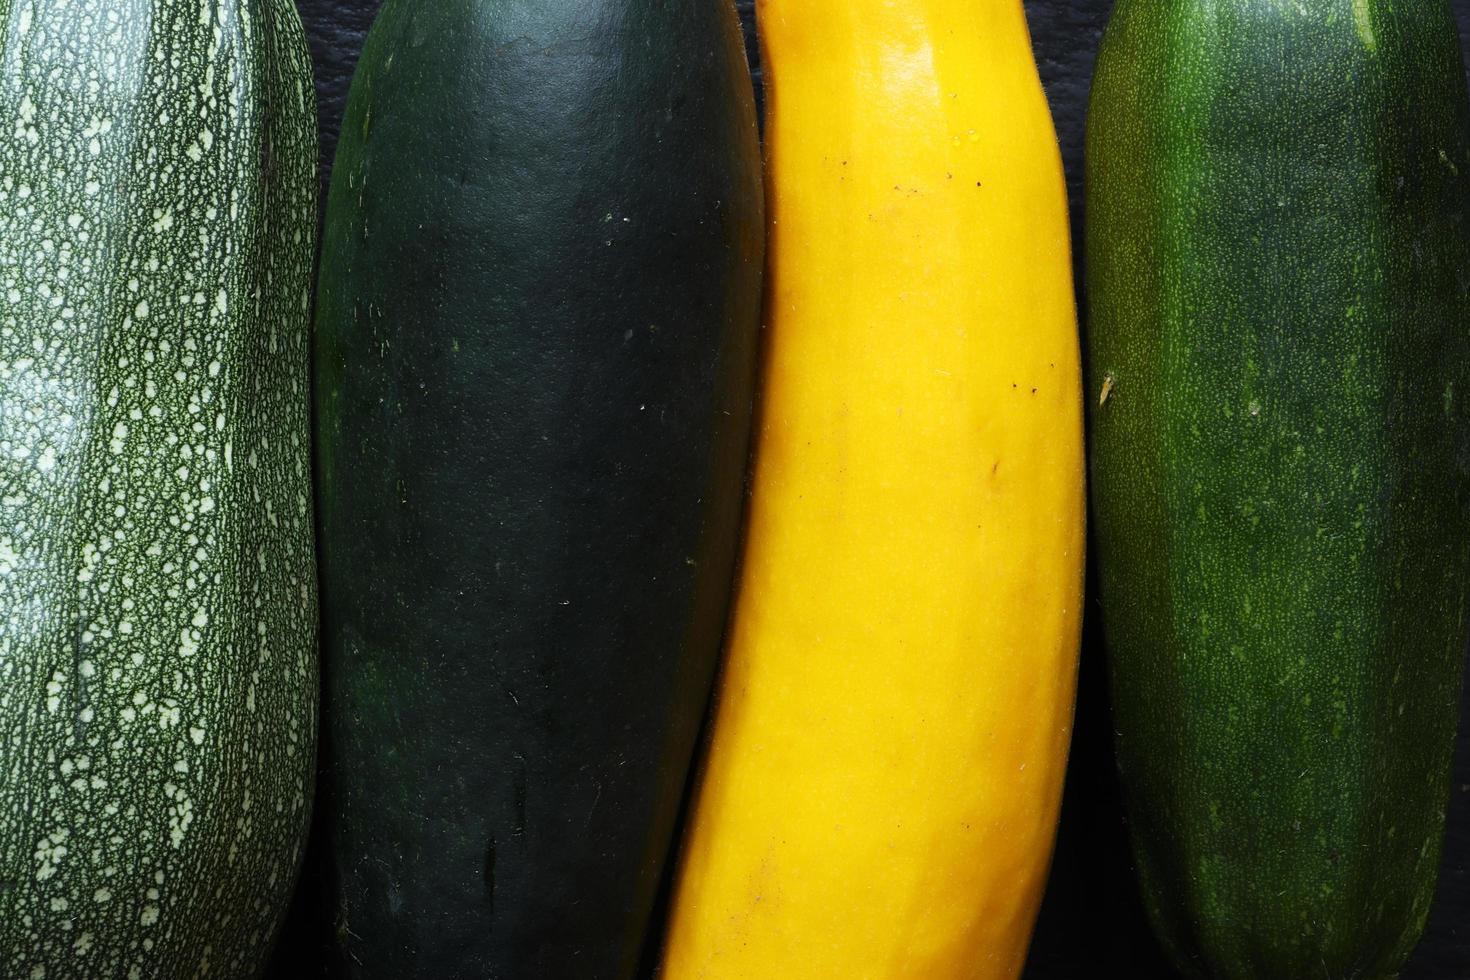 quattro varietà di zucchine da vicino foto